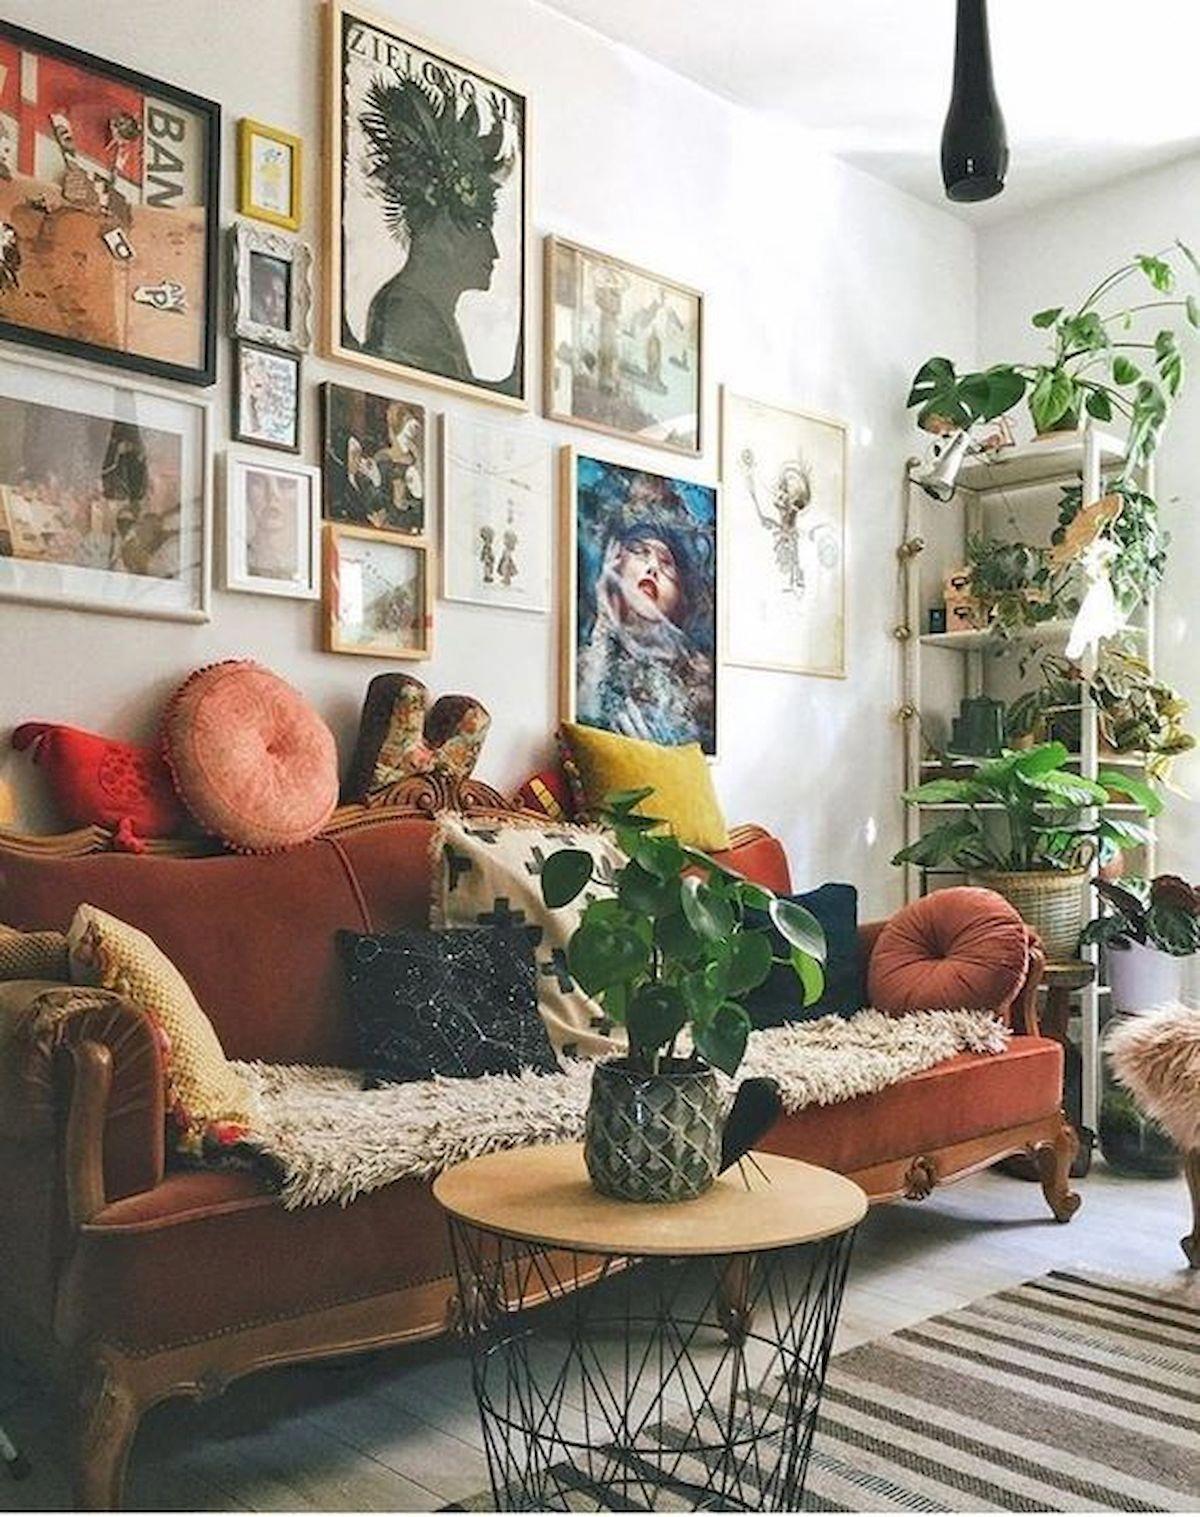 Boholivingroom Eclectic Living Room Design Eclectic Living Room Living Room Decor Apartment Living room ideas eclectic